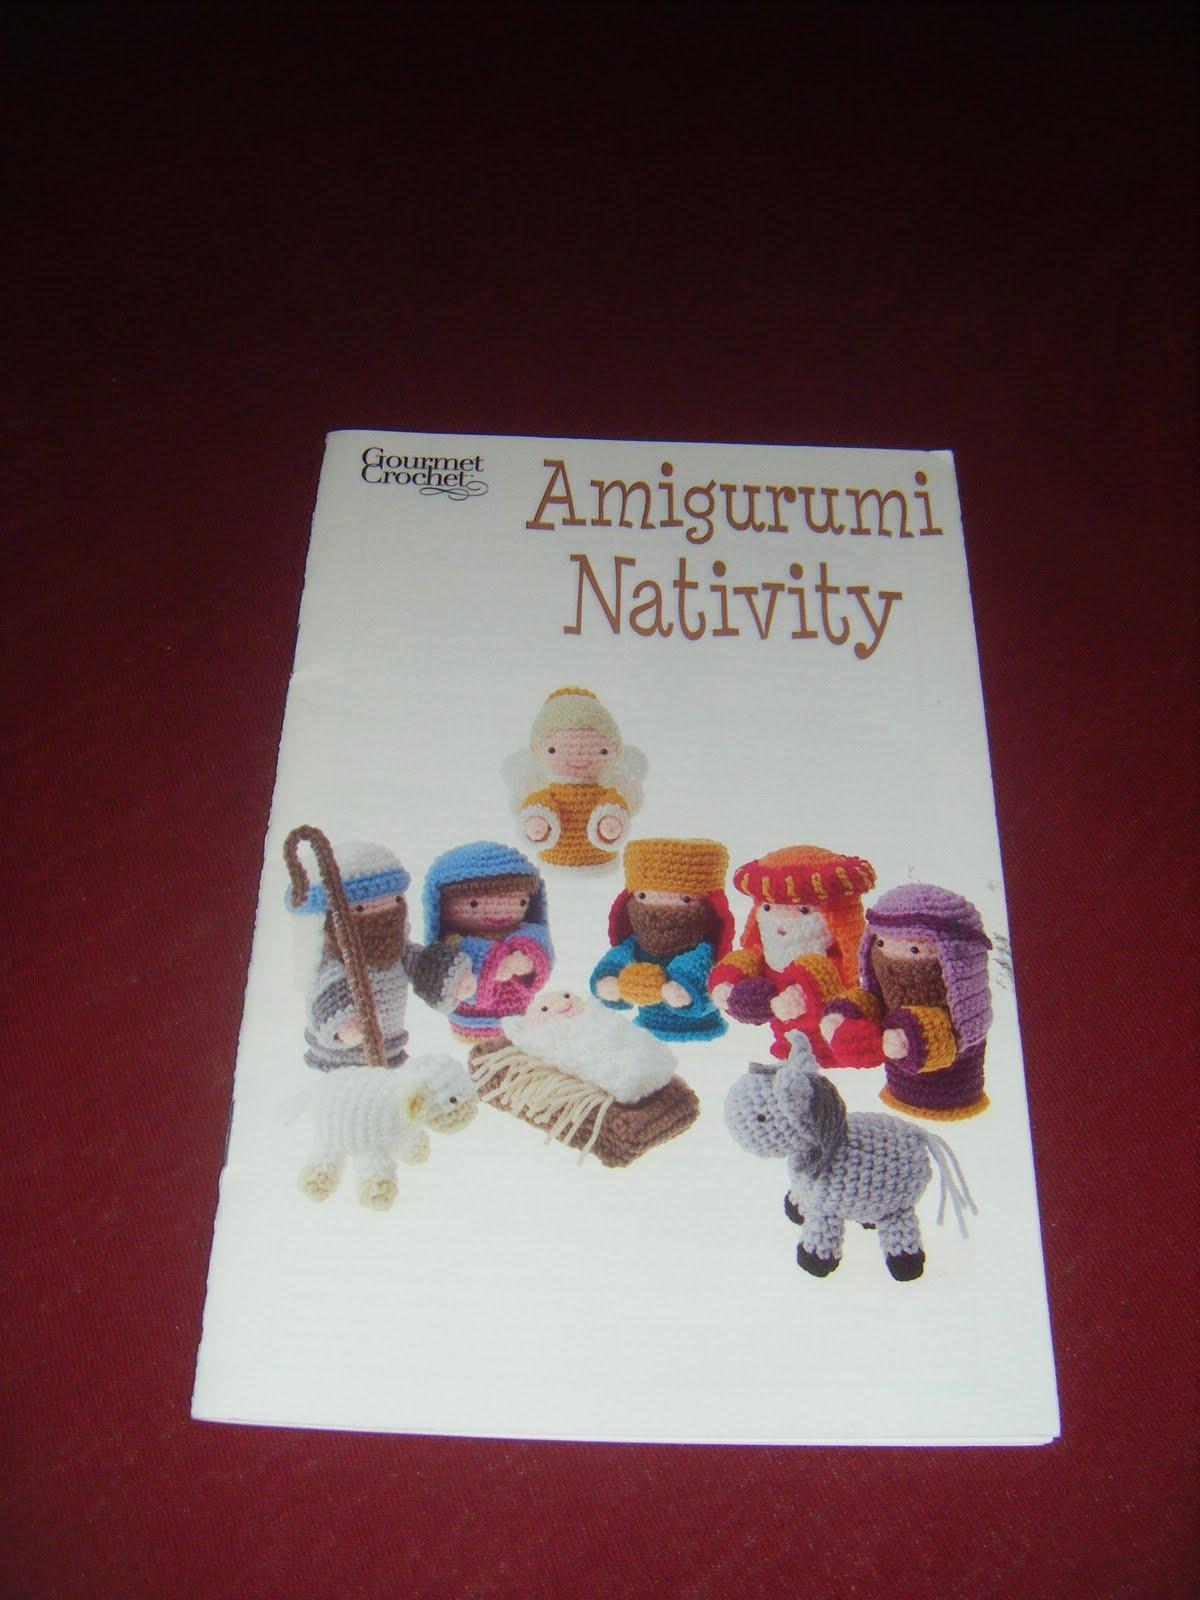 The glorious books!: Amigurumi Nativity